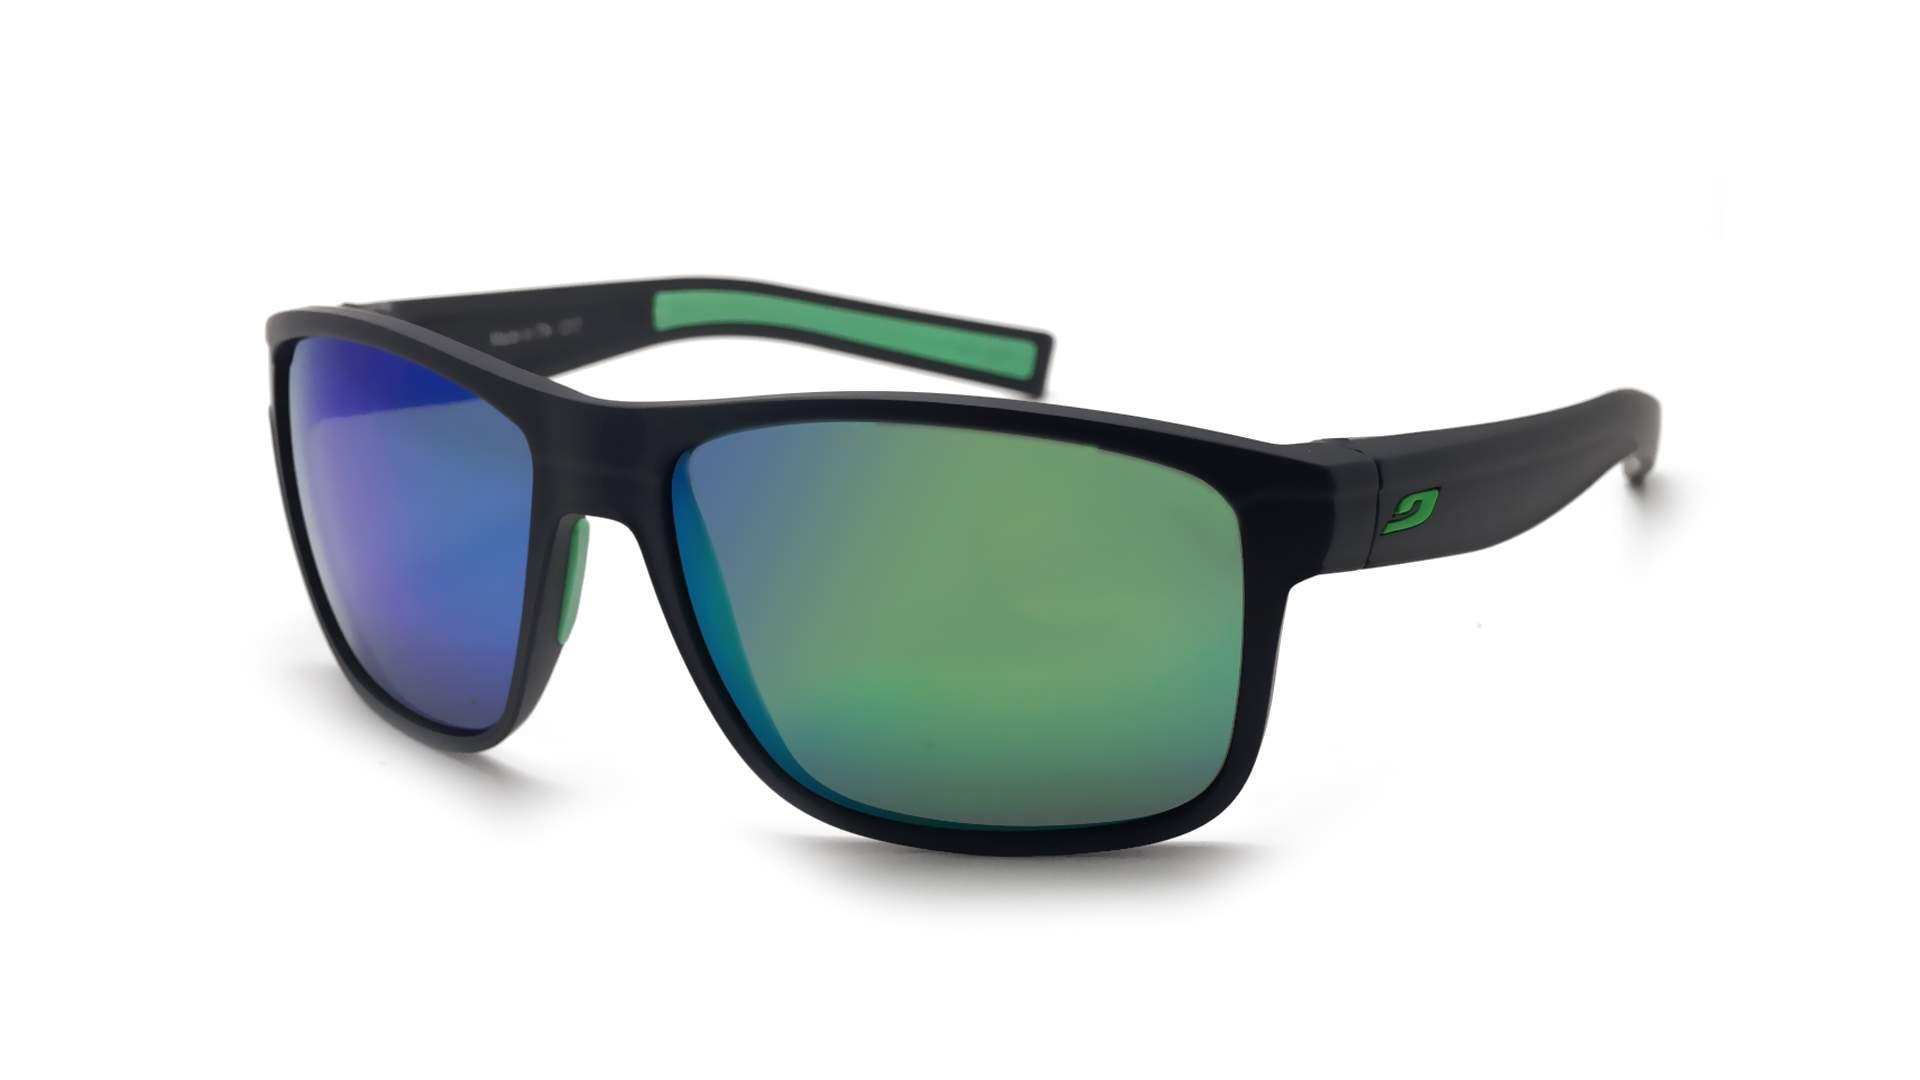 c4634fcad46 Sunglasses Julbo Renegade Blue Matte J499 1112 59-17 Large Mirror